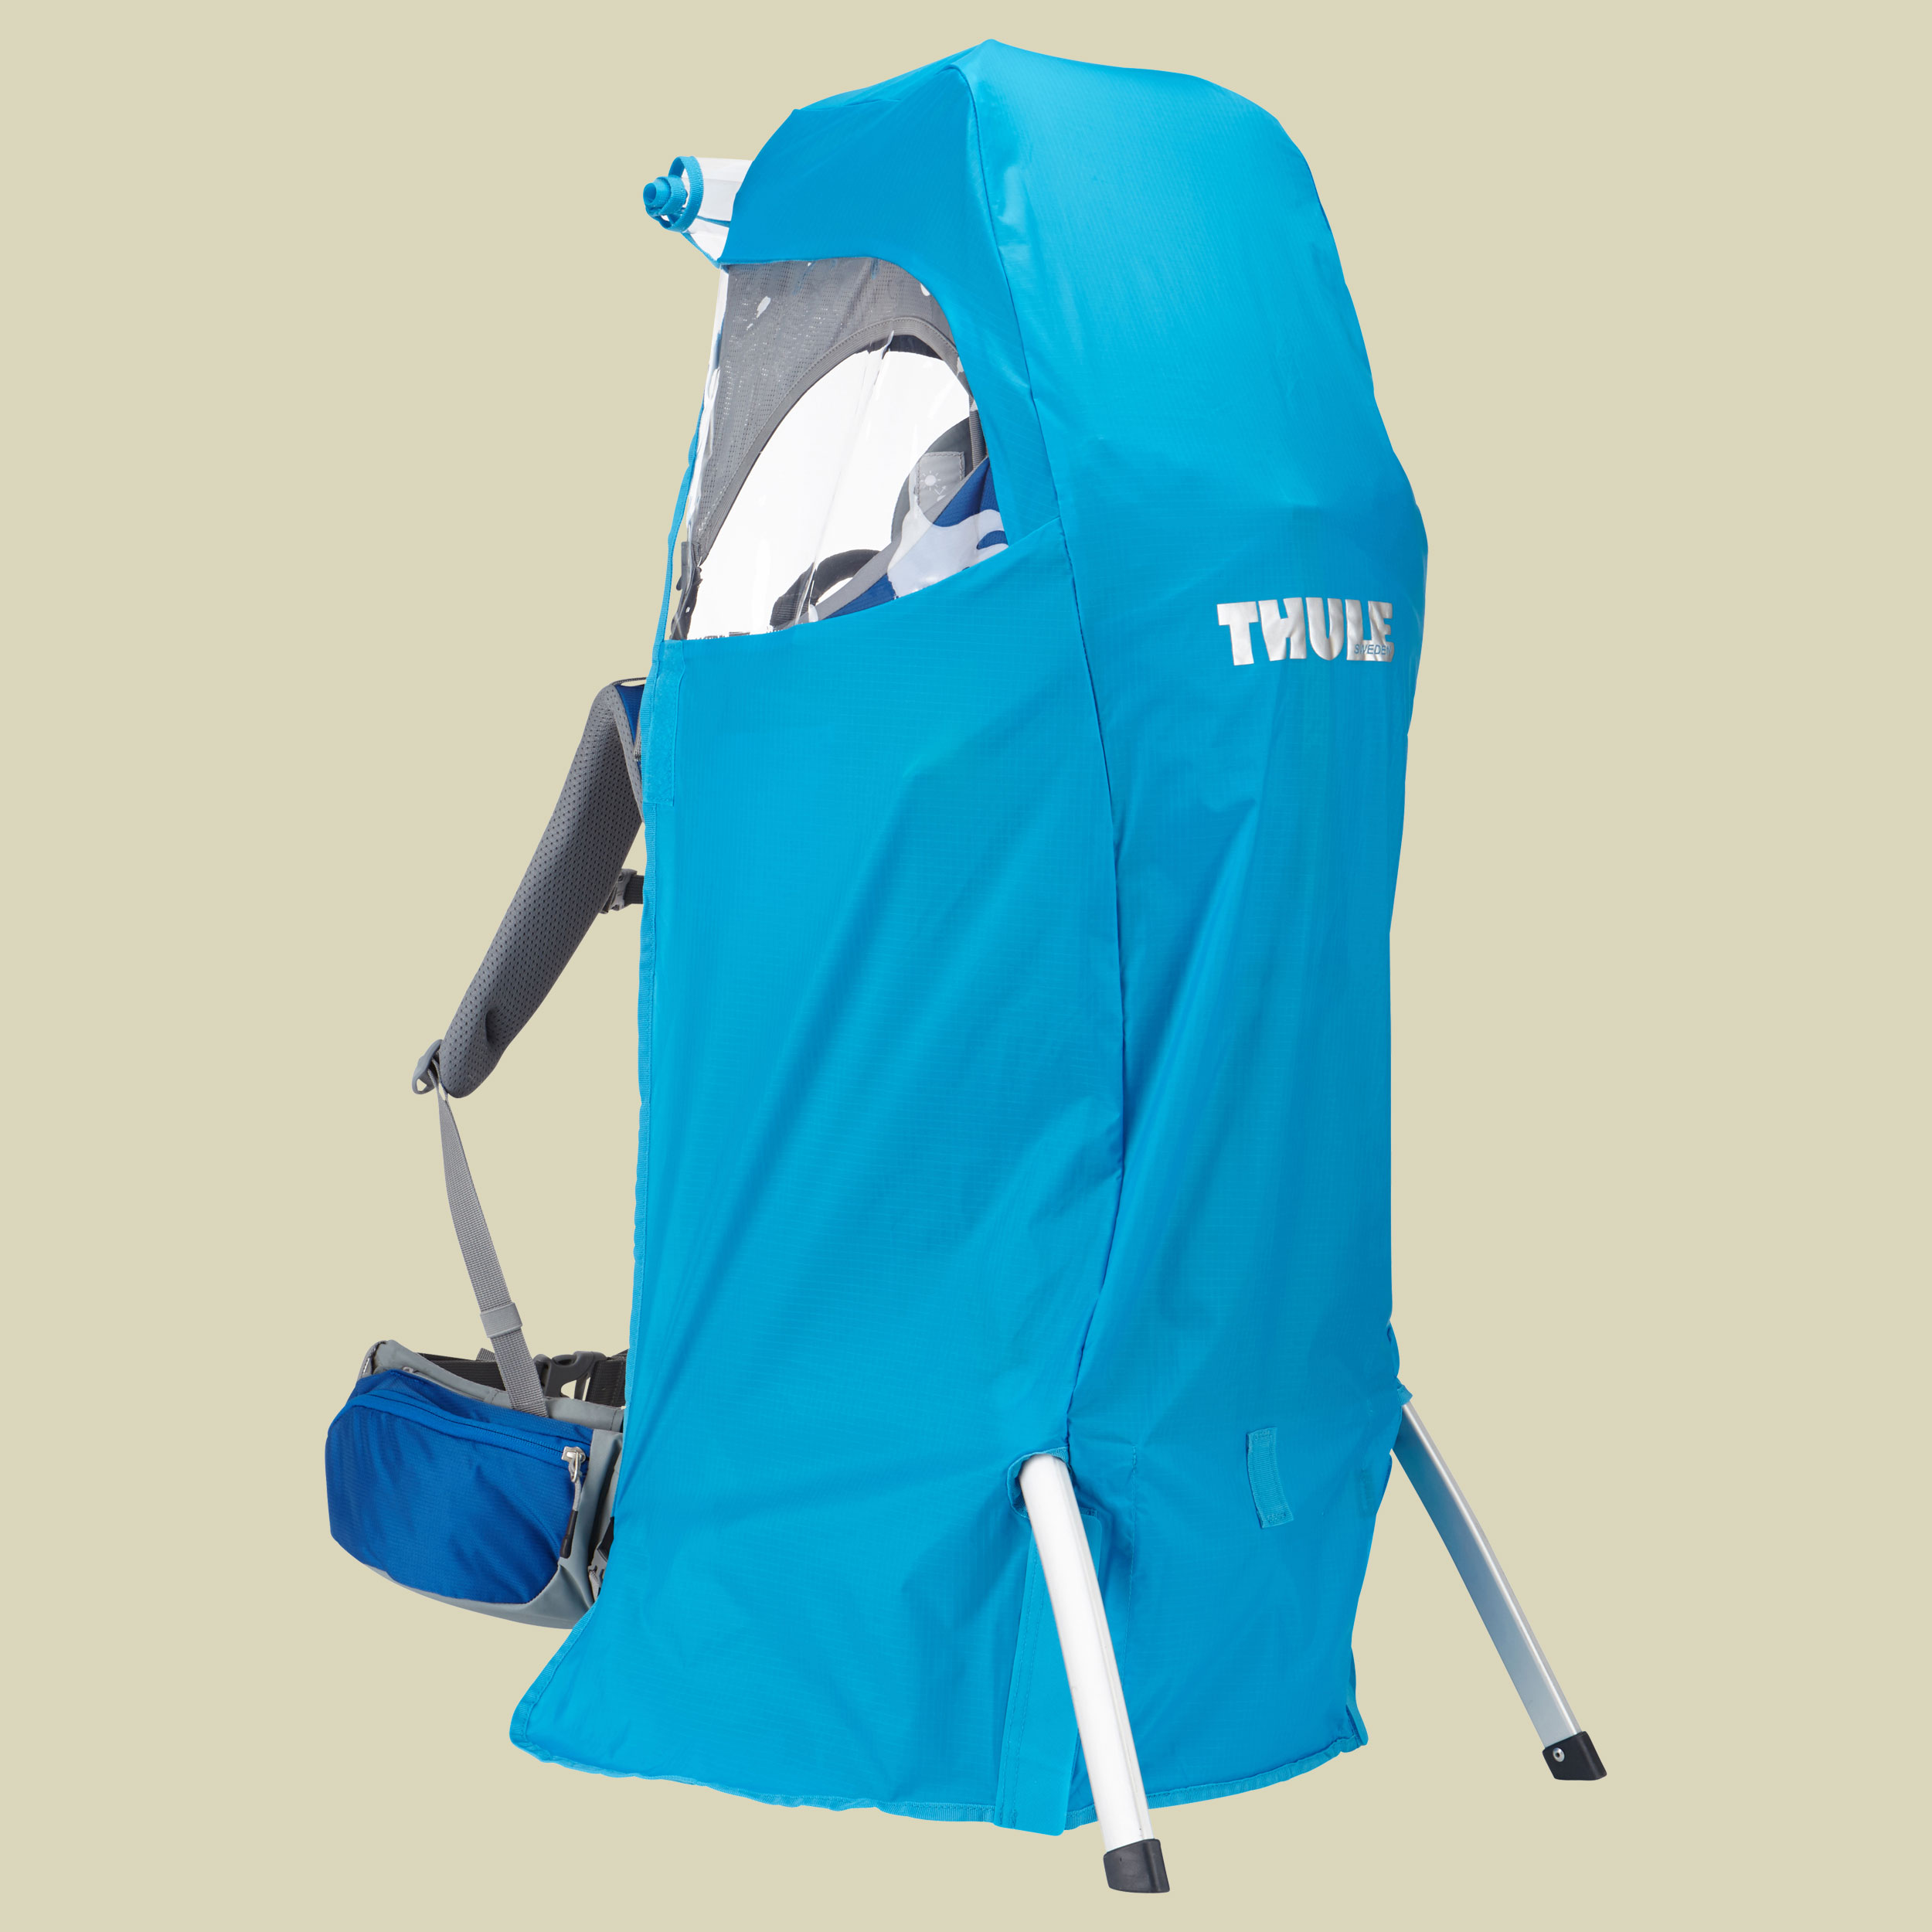 Thule Sapling Rain Cover Regenhülle für Kindertrage   blue